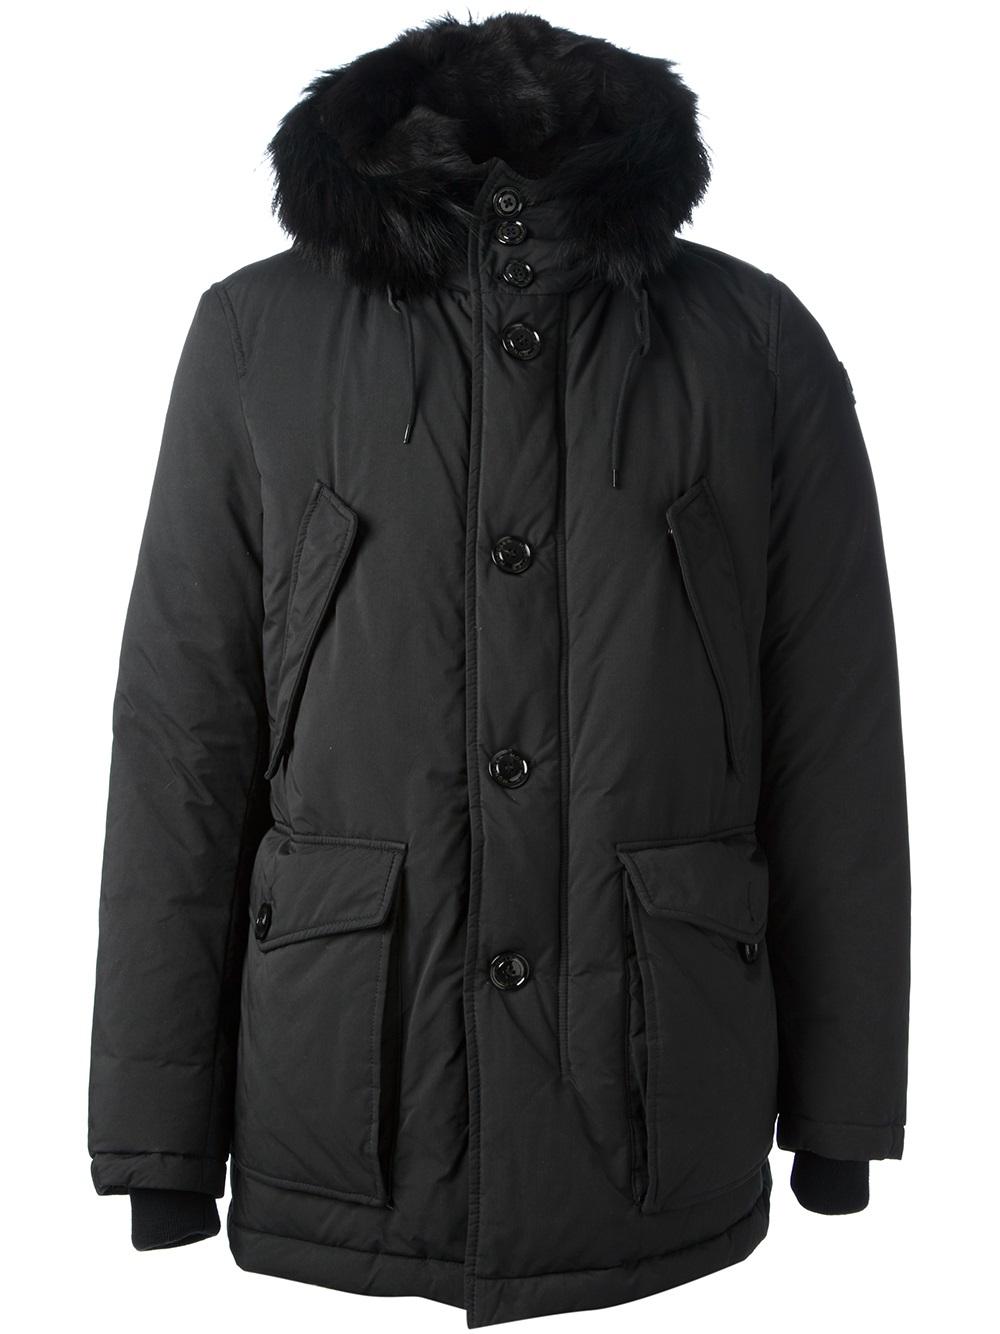 Moncler Chateaubriant Jacket in Black for Men